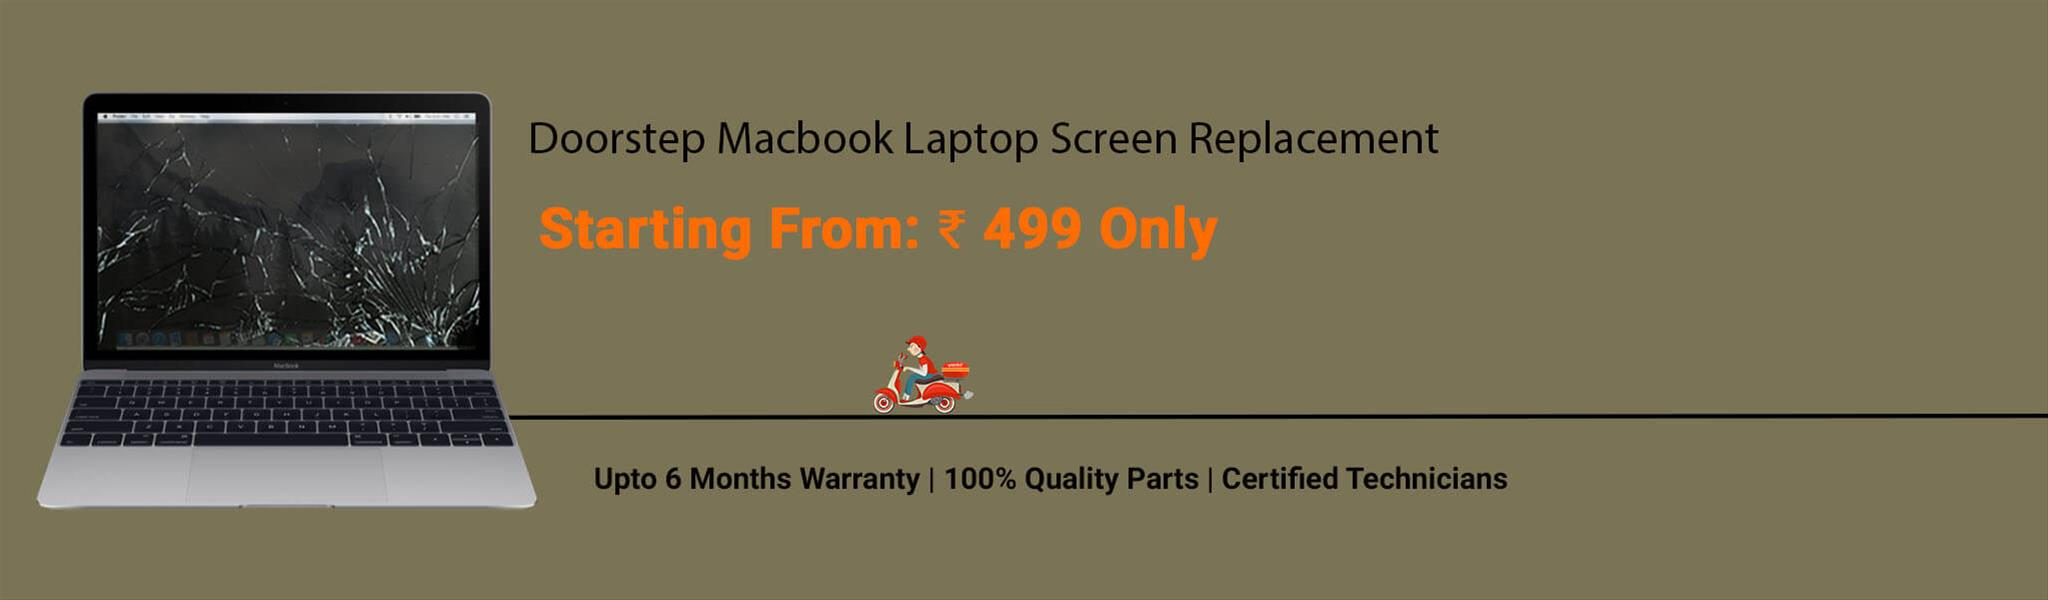 macbook-laptop-screen-replacement.jpg